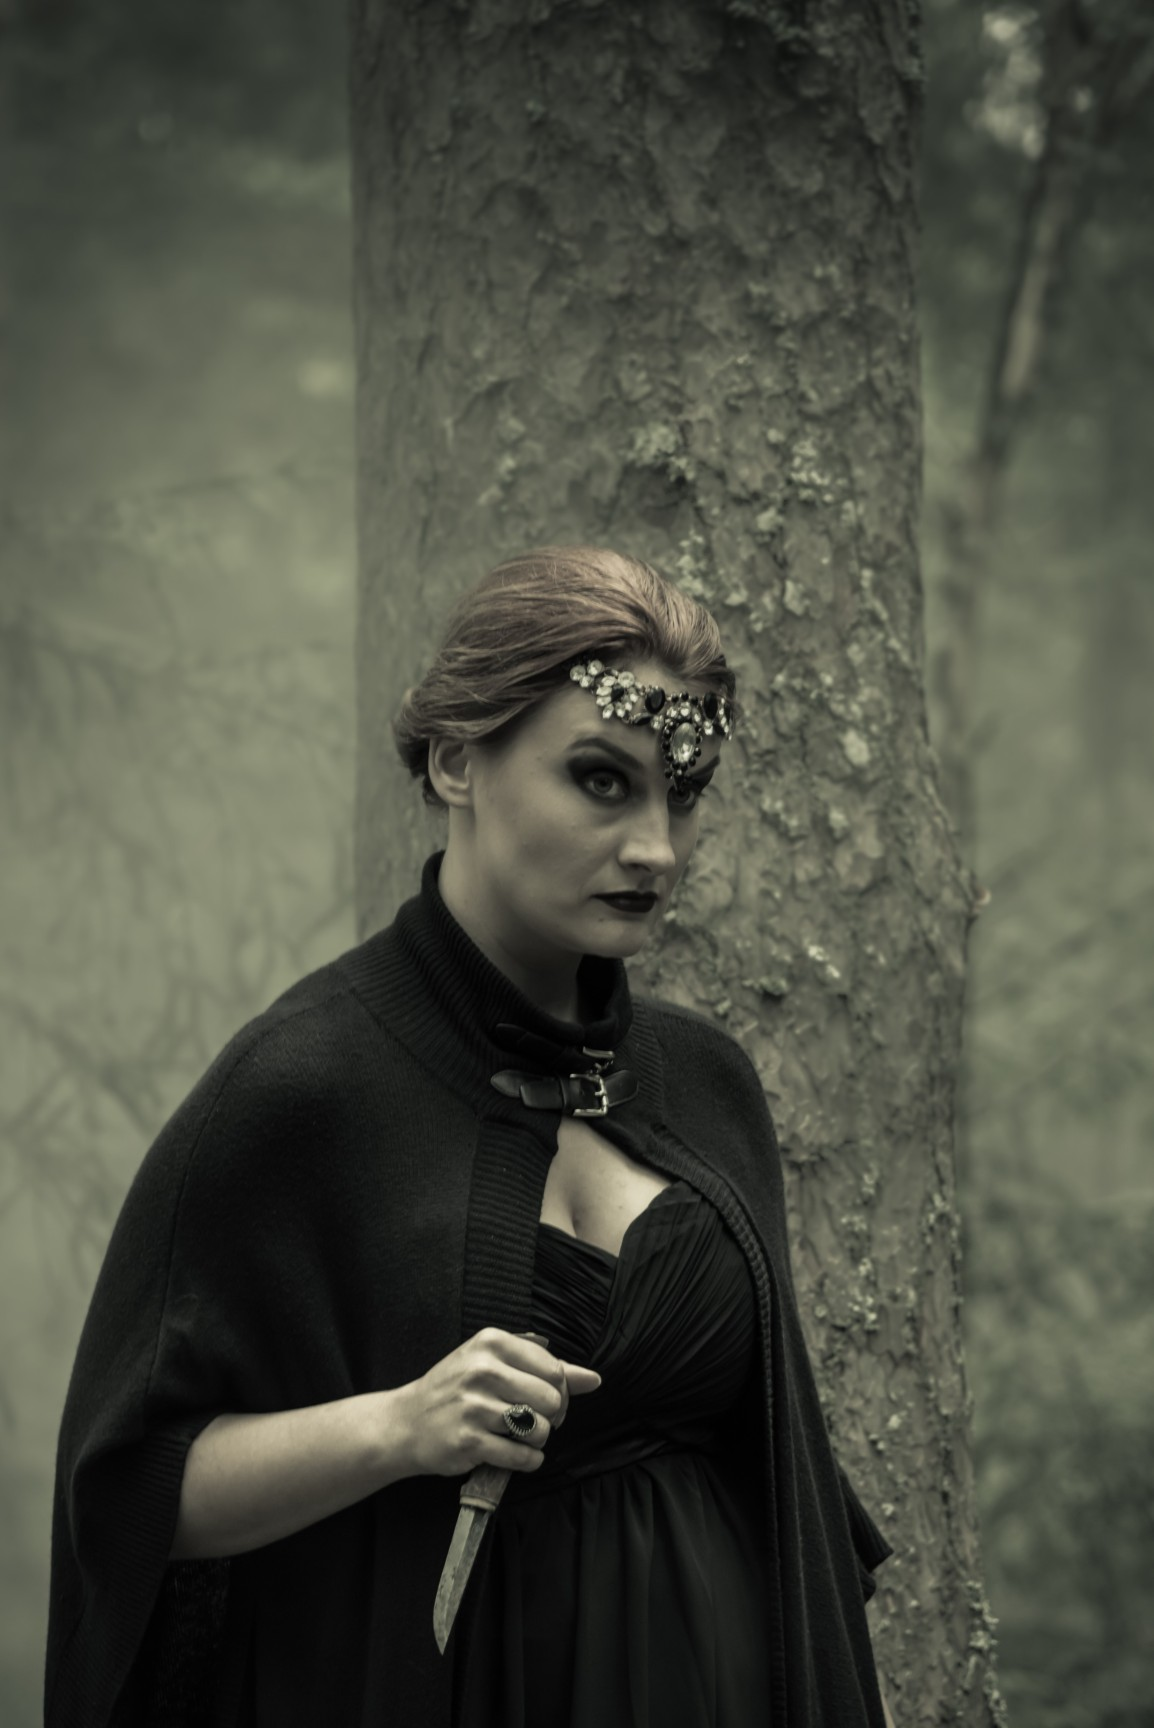 Fantaasiajumestus - jumestaja Ilona Tint